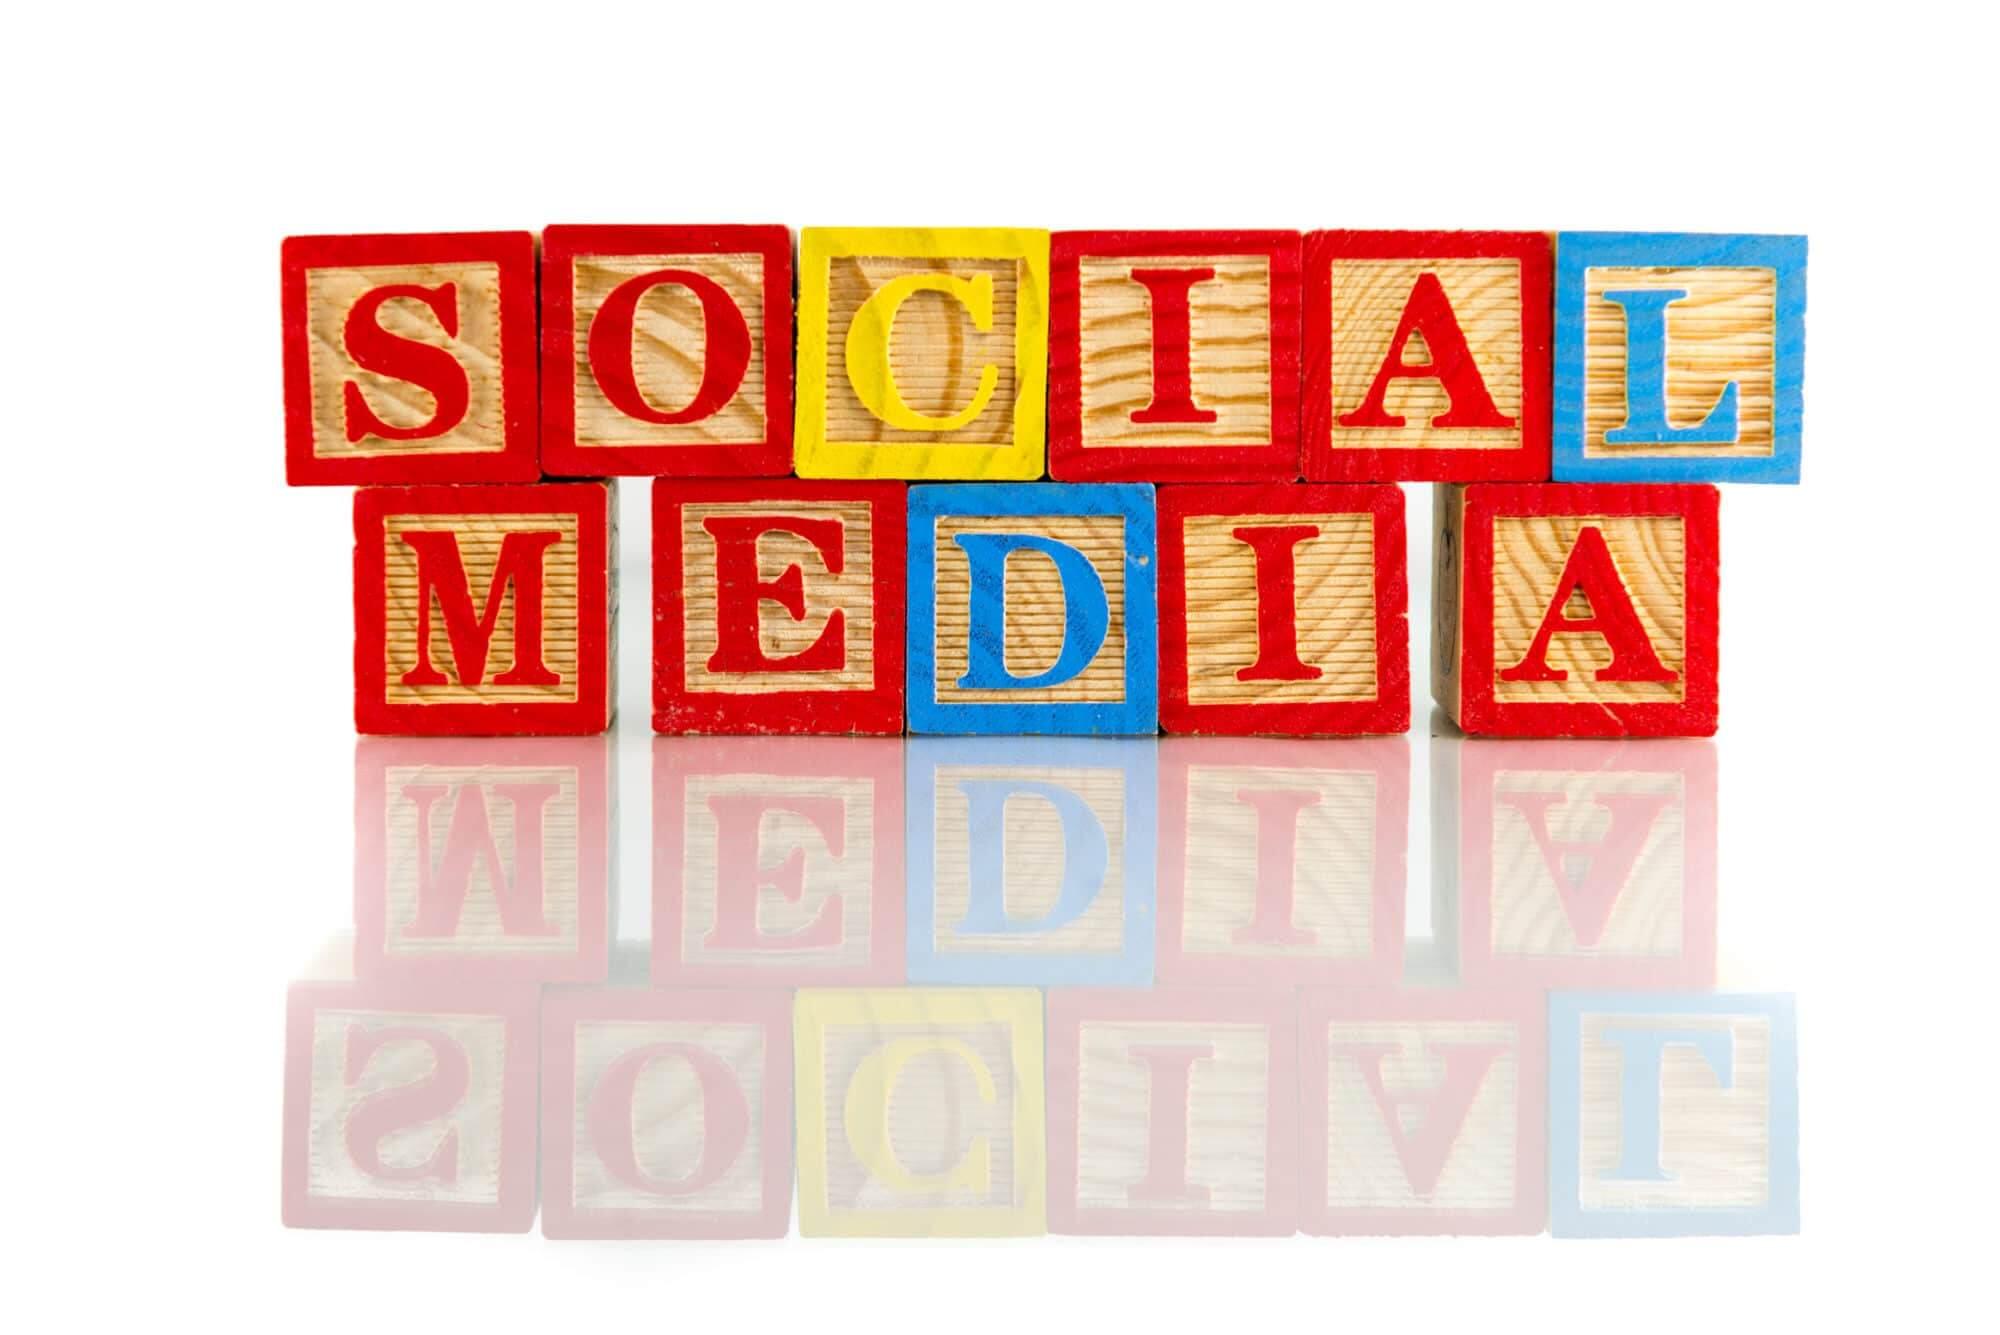 Le Social Media expliqué par Gabriel Dabi-Schwebel et Kevin Dangu